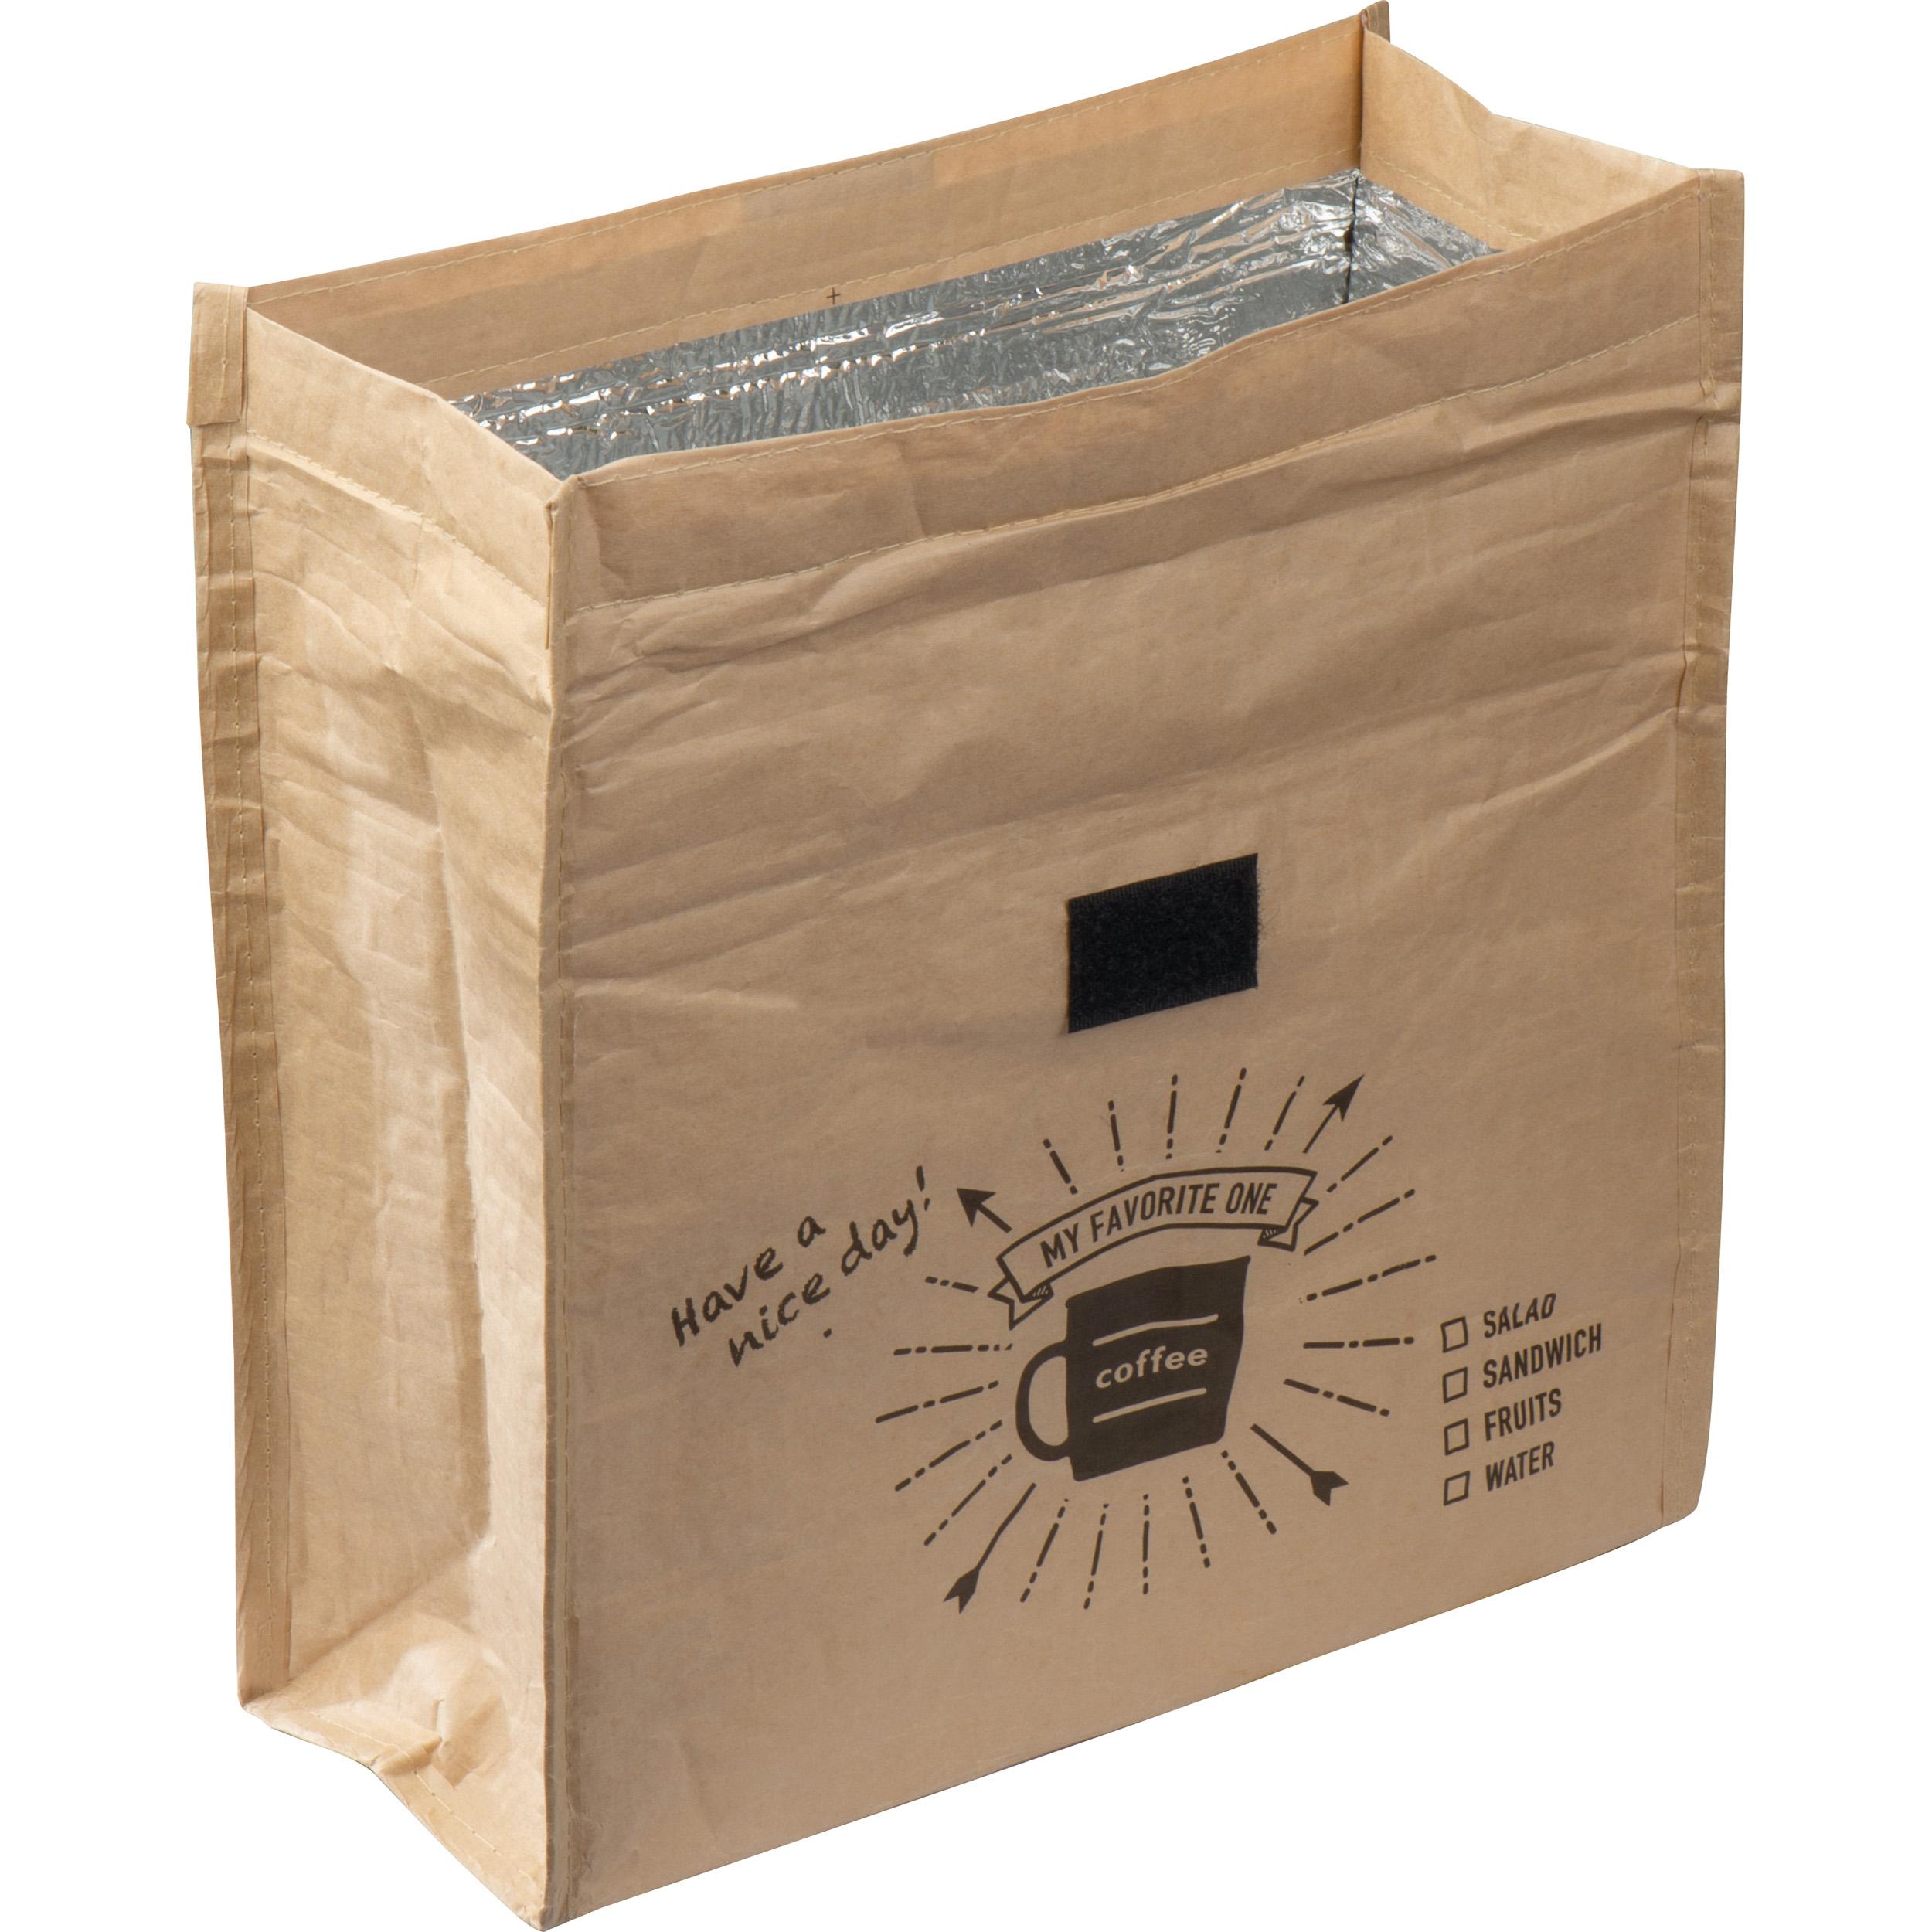 Pochette isolée avec enveloppe